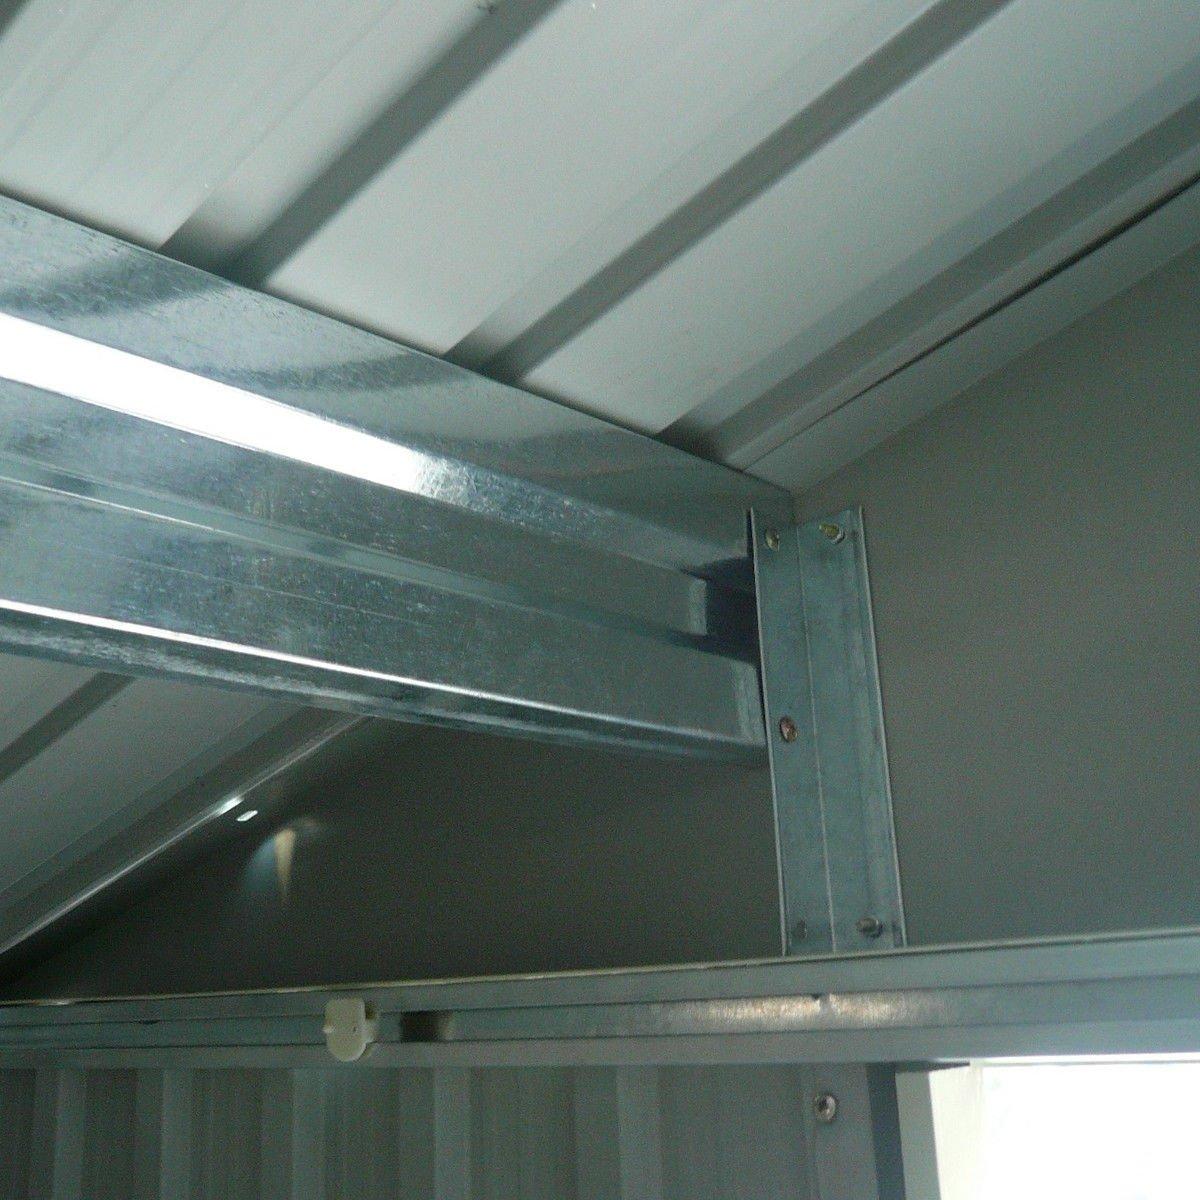 9' X 6' Outdoor Garden Storage Shed Tool House Sliding Door Steel Khaki New by tamsun (Image #9)